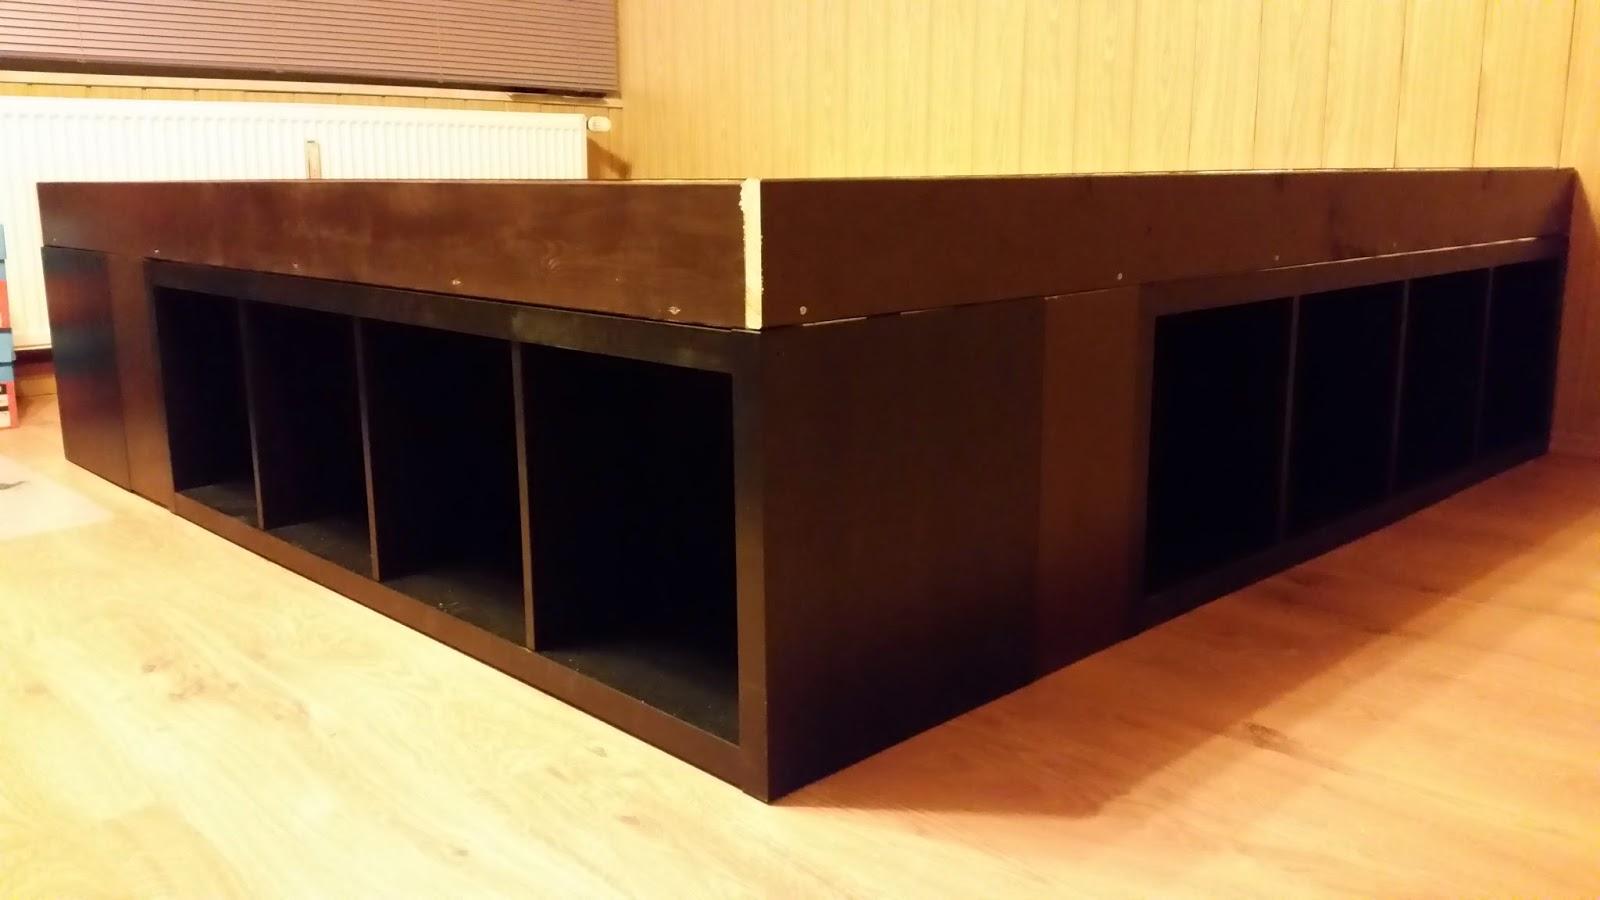 gc geocaching frau harke sagenpfad map. Black Bedroom Furniture Sets. Home Design Ideas